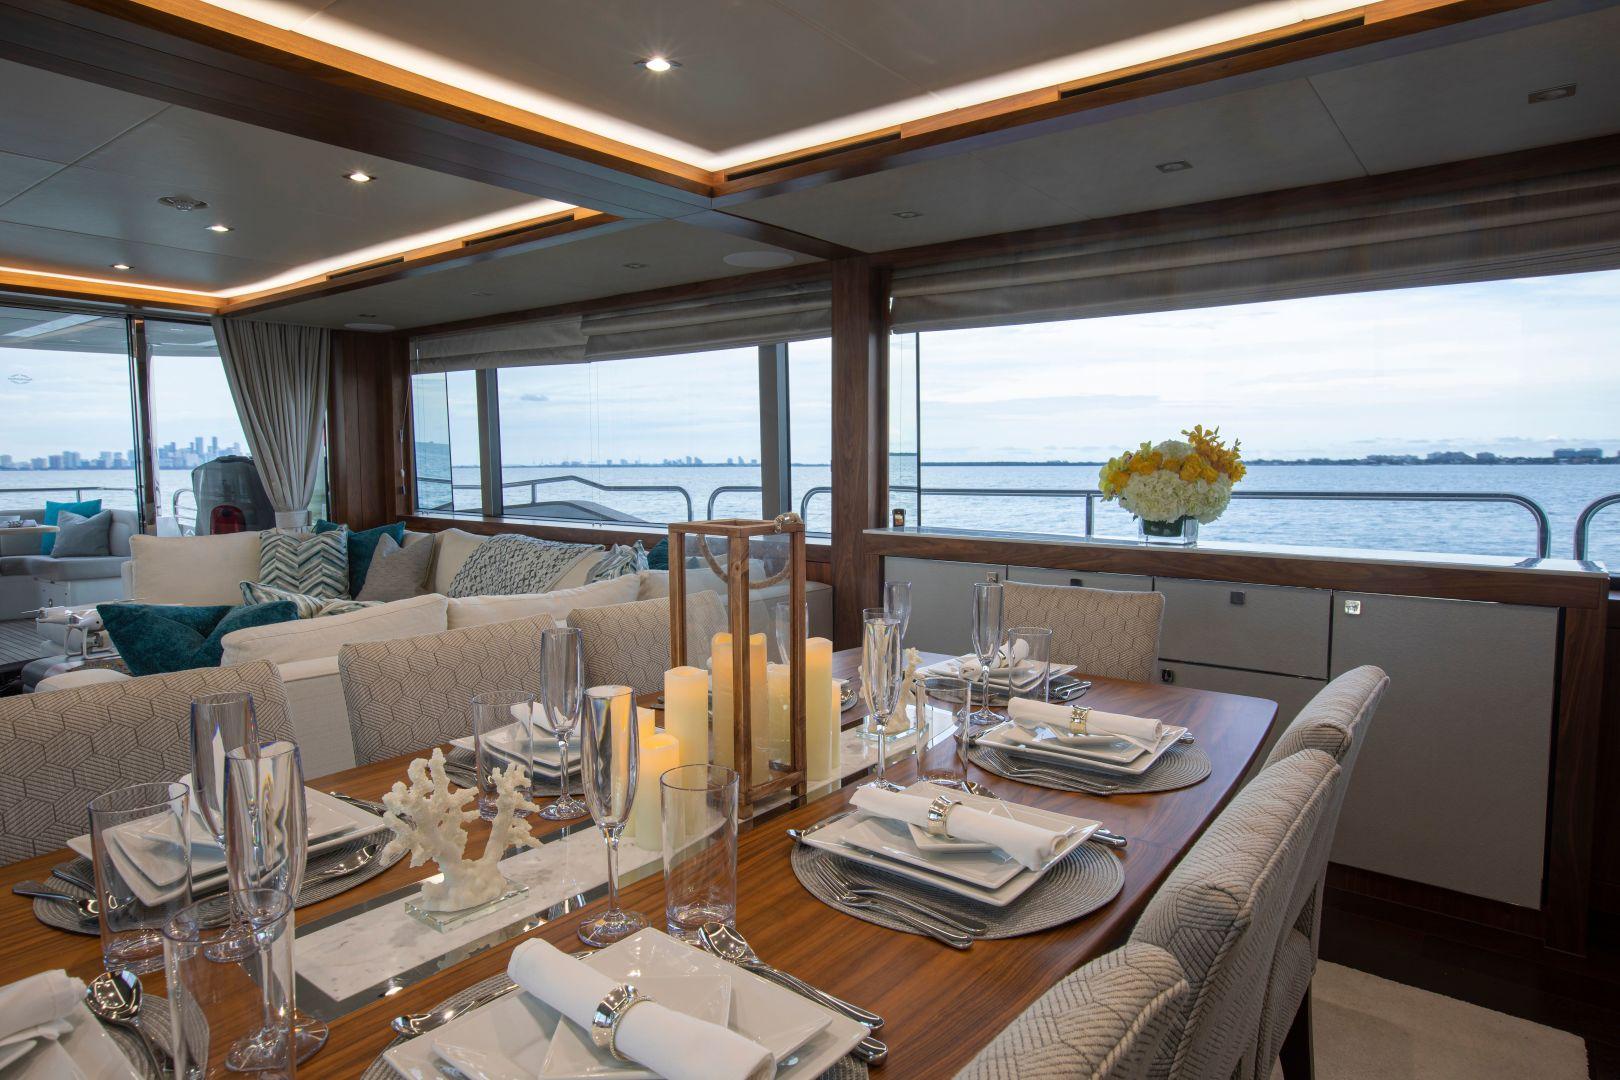 Sunseeker-95 Yacht 2017-Perseverance 3 Ft Lauderdale-Florida-United States-1400080   Thumbnail